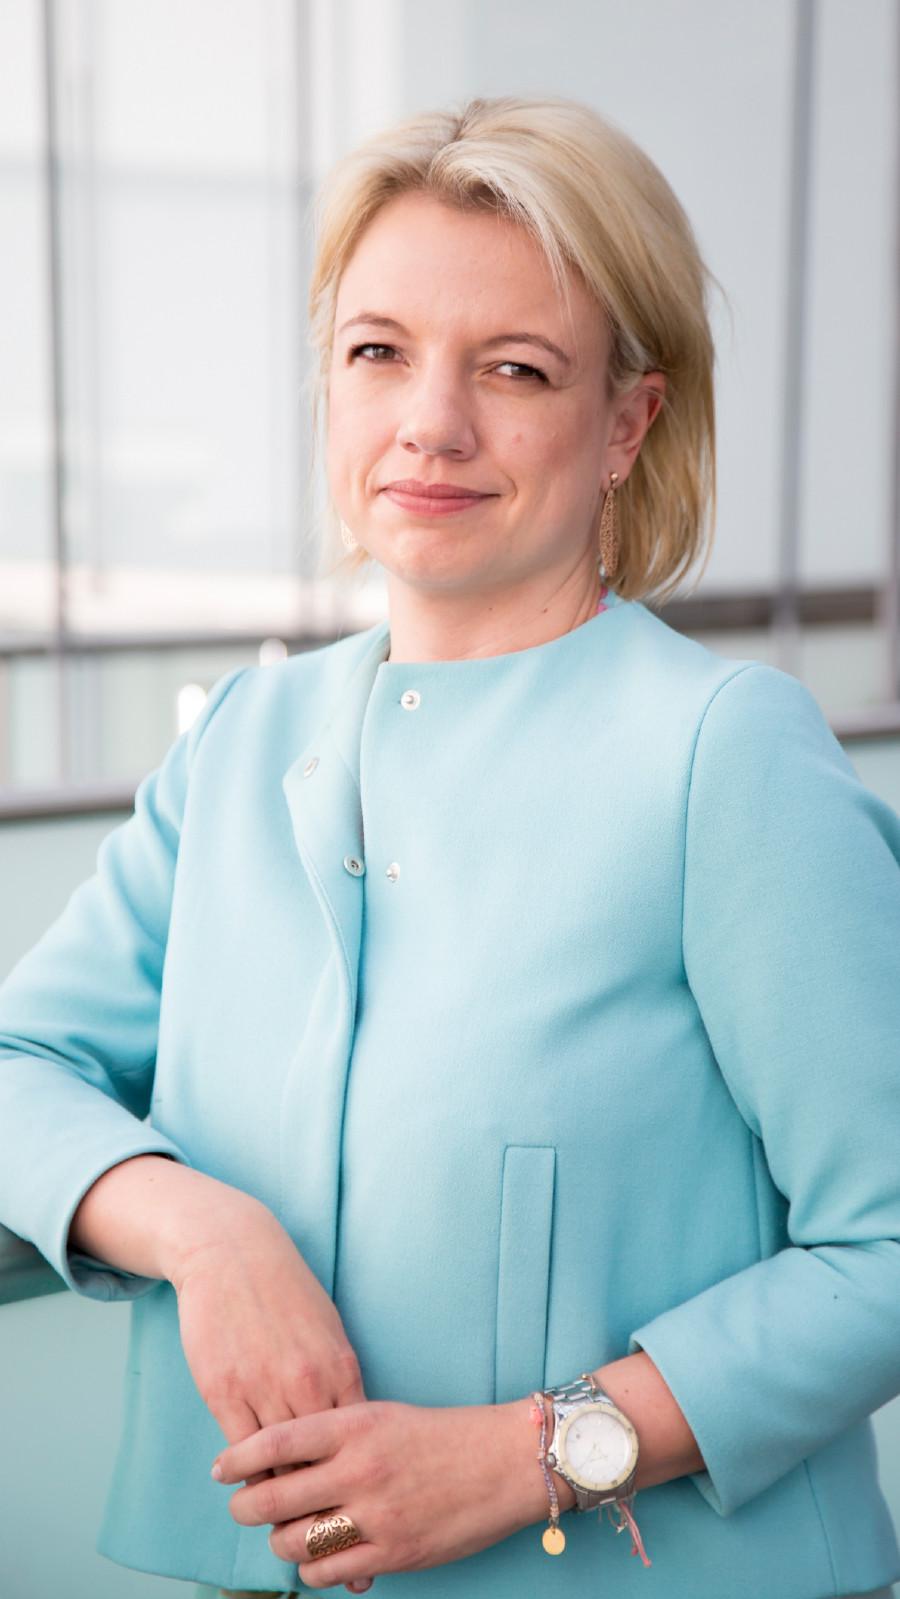 AK-Bildungsexpertin Katrin Hochstrasser © Graf-Putz, AK Stmk